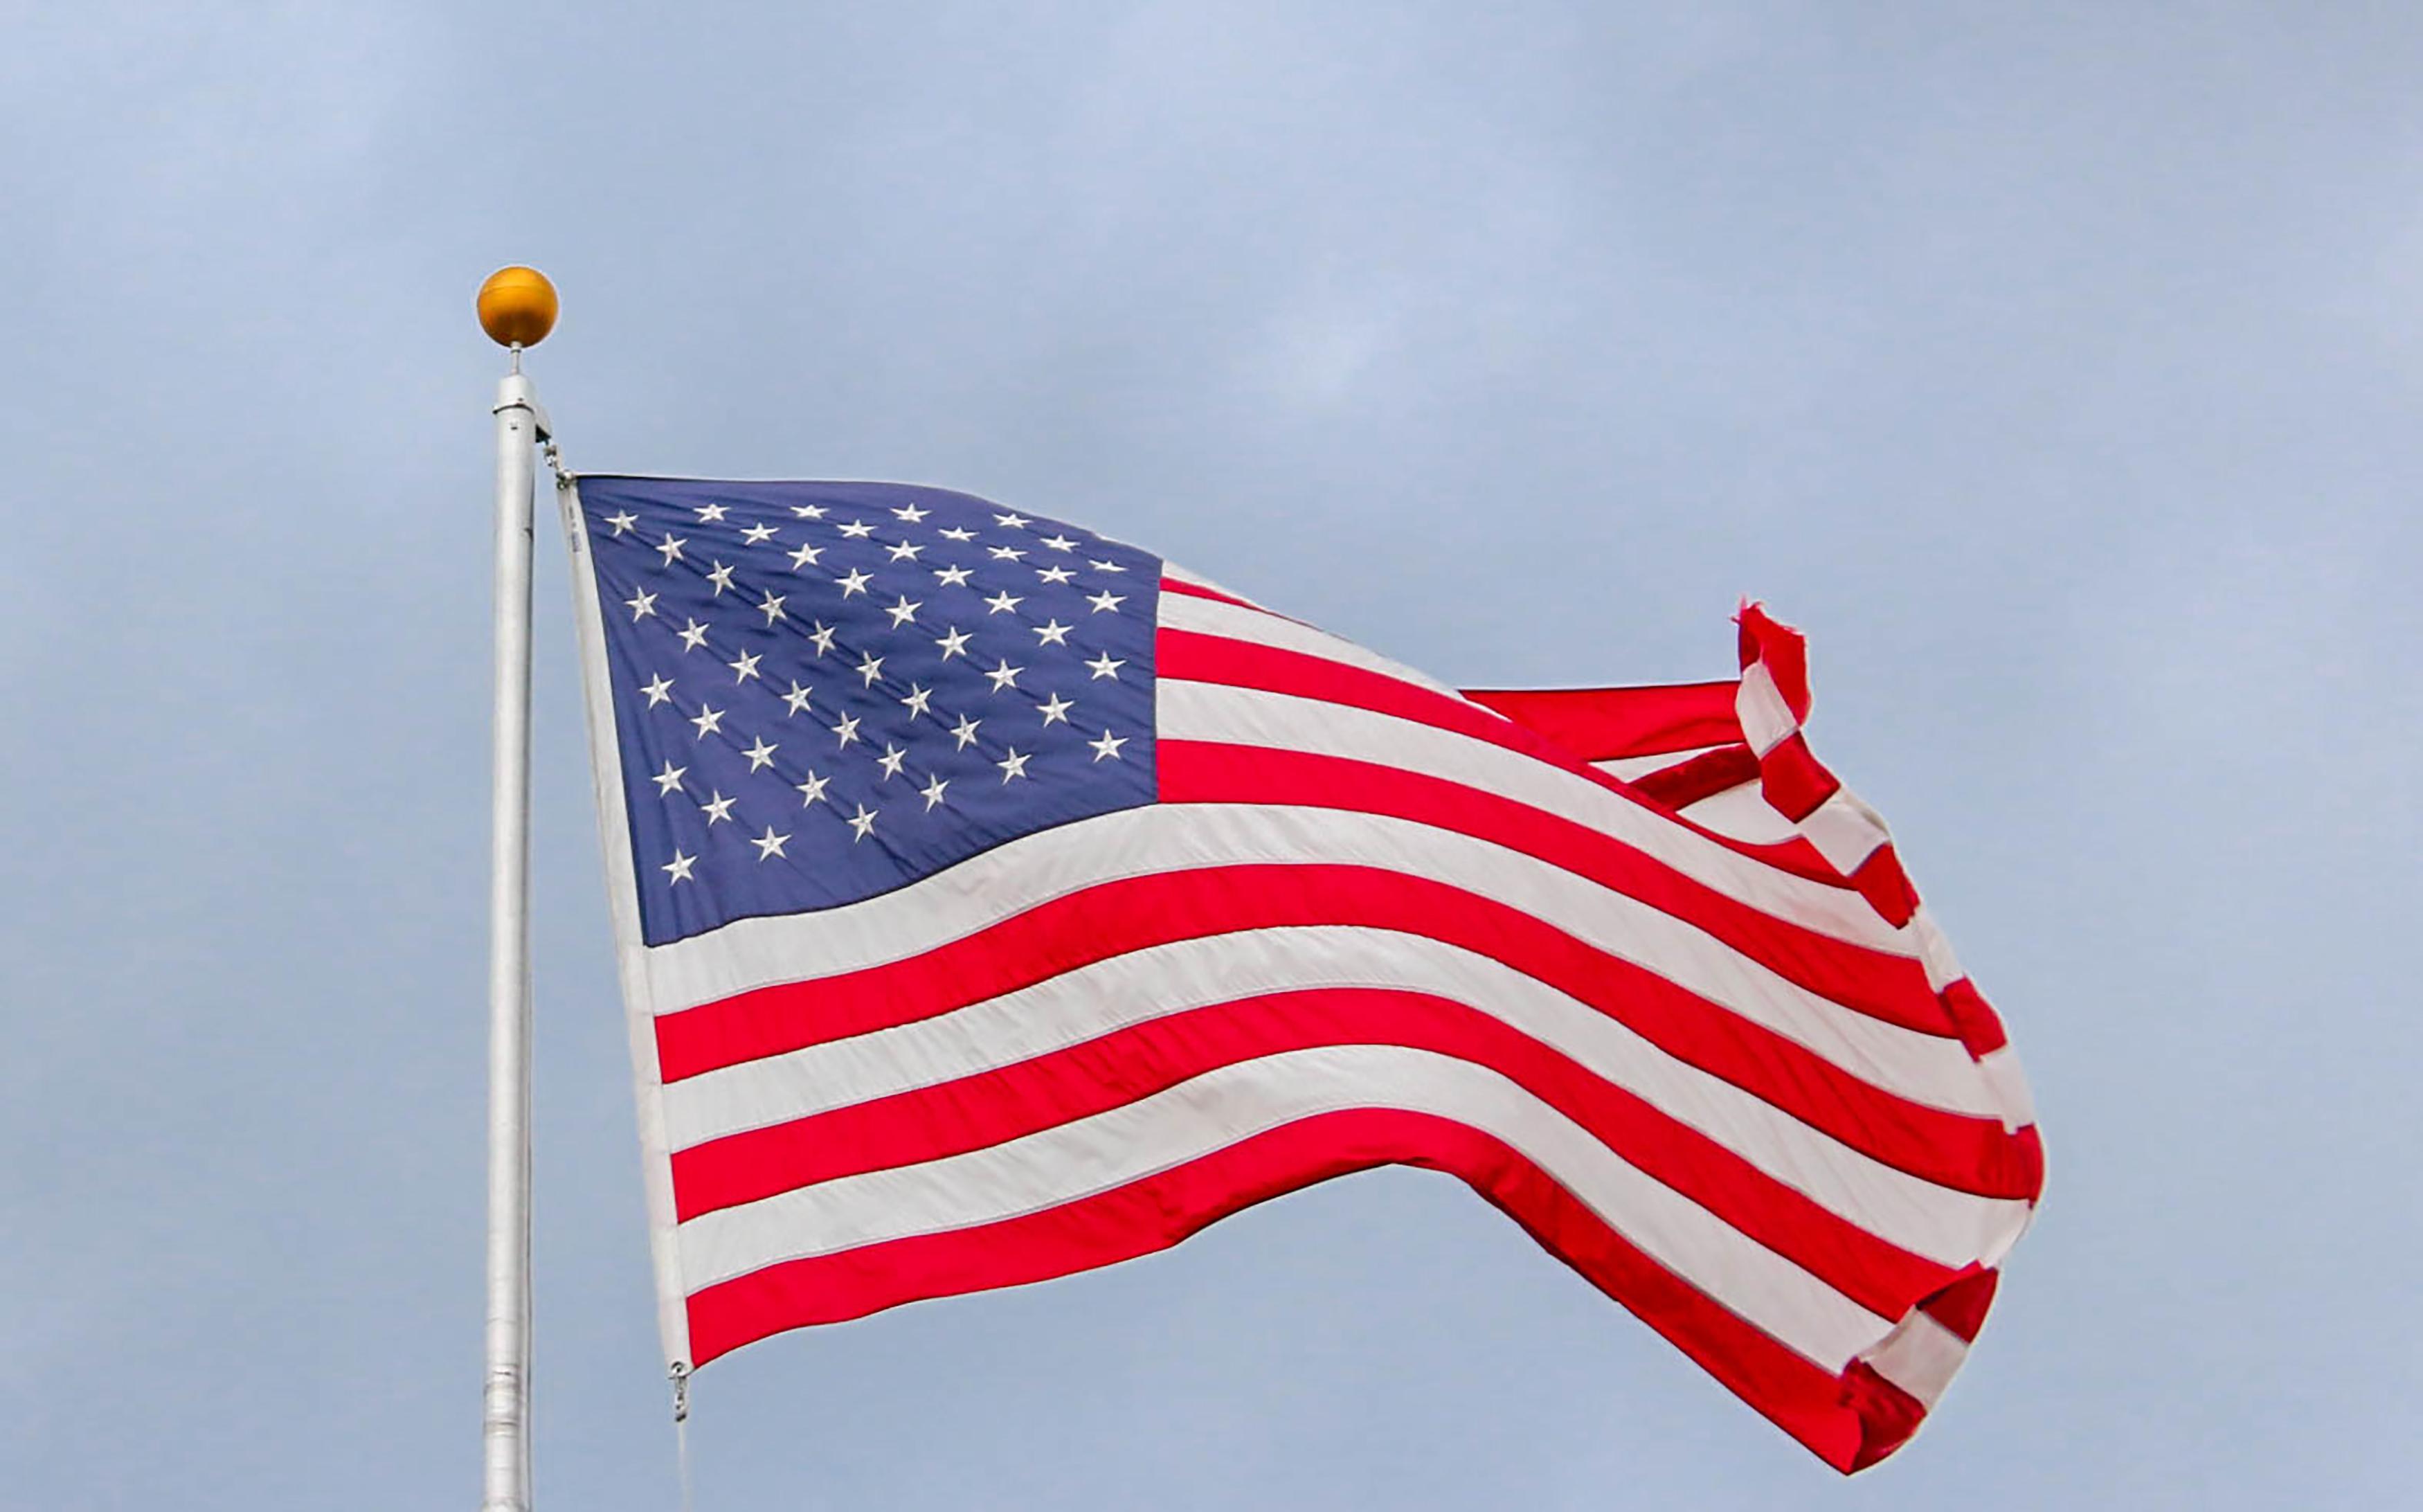 usa-flag-waving-on-white-metal-pole-1550342.jpg